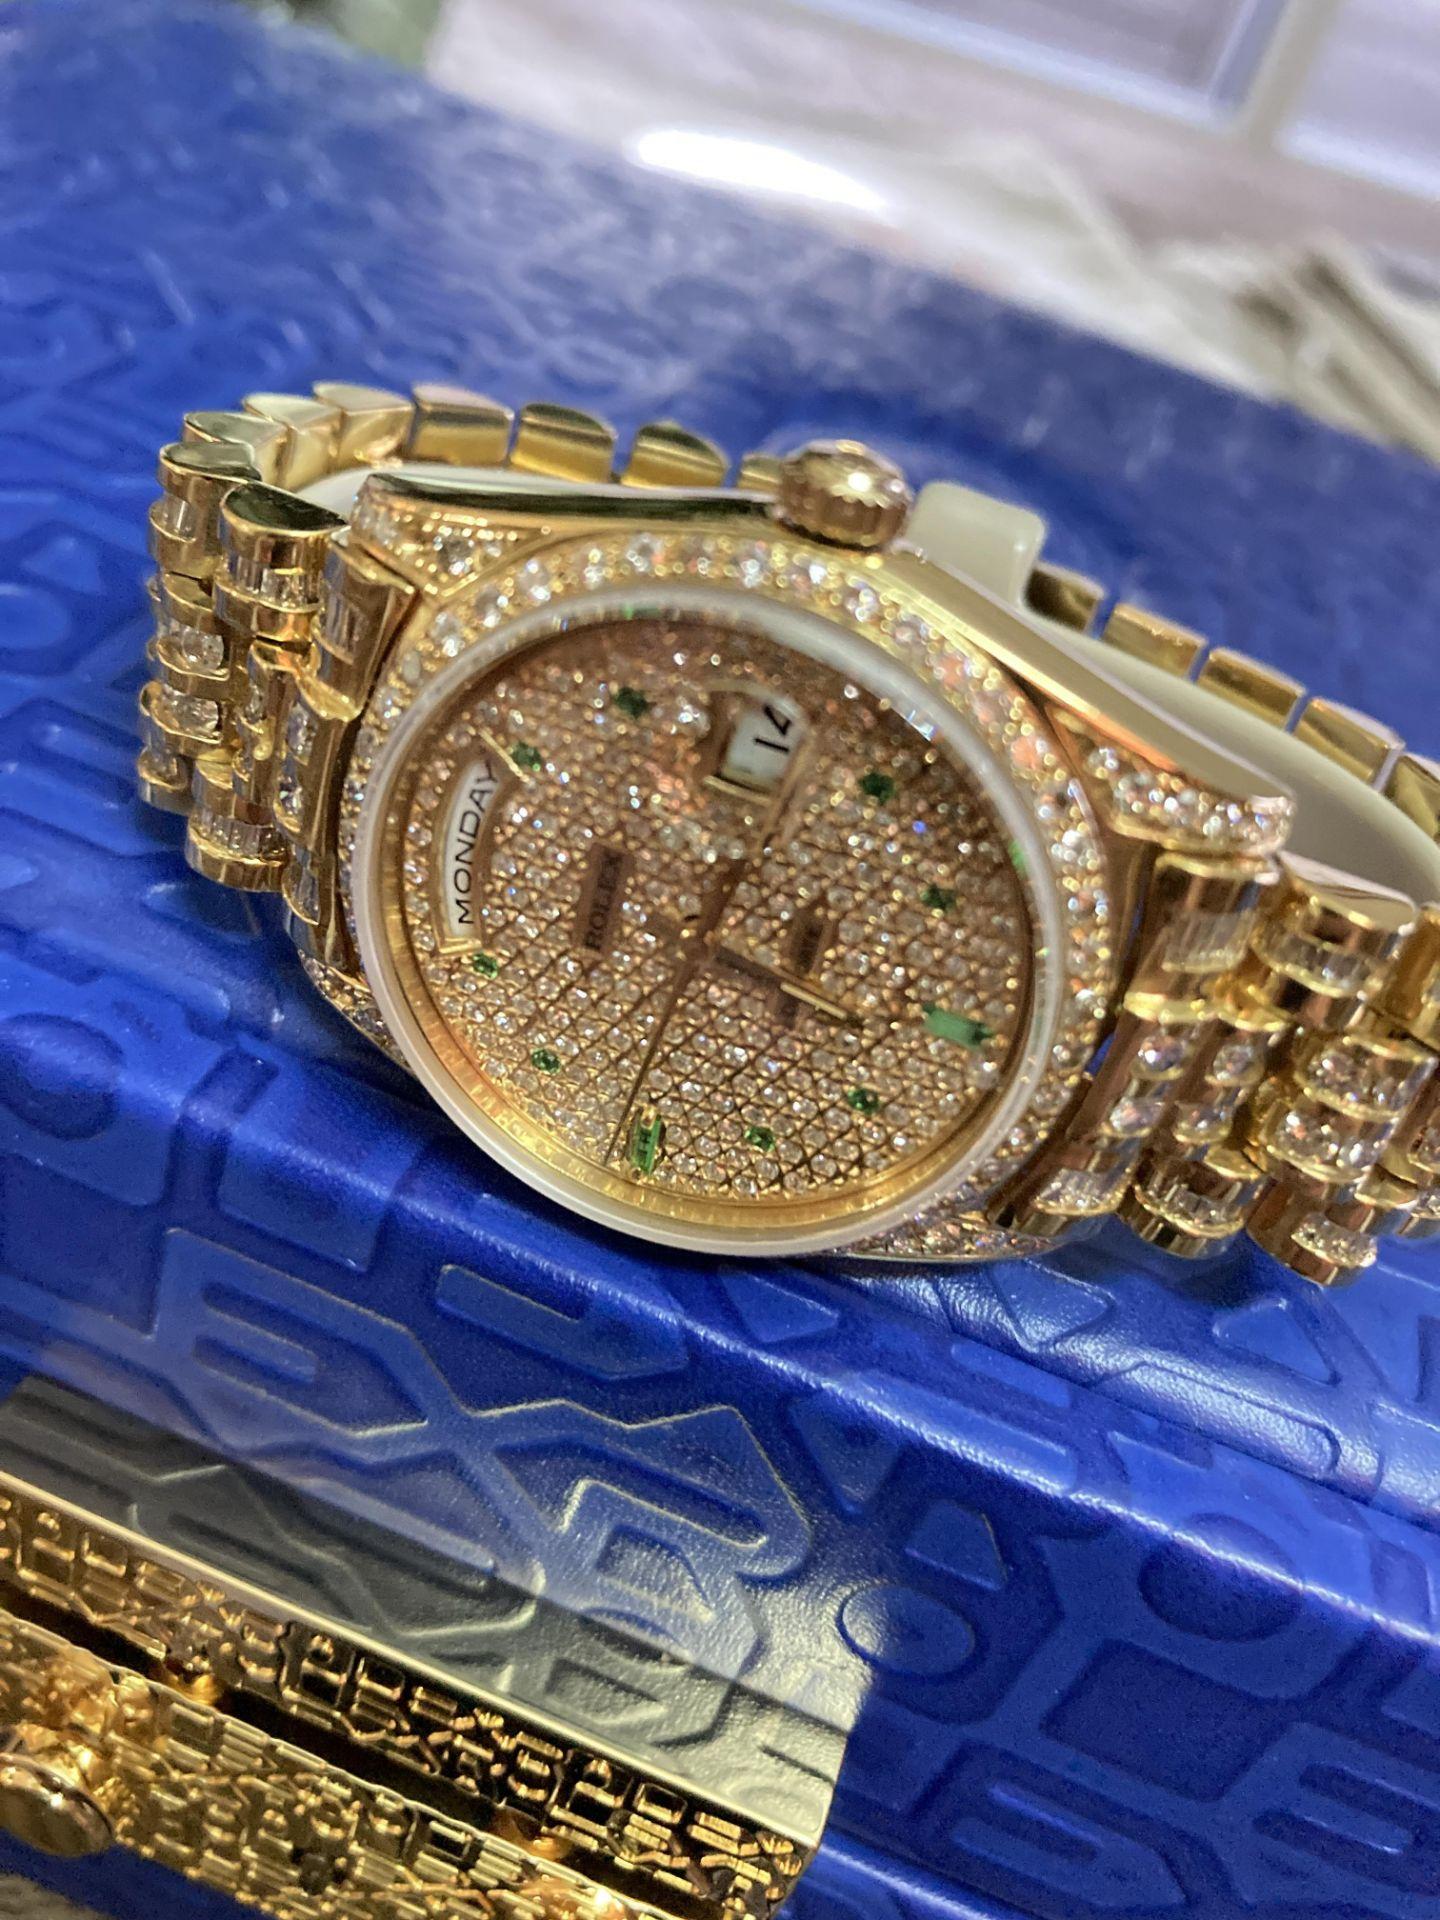 GENTS 36mm ROLEX DAYDATE YELLOW GOLD DIAMOND WATCH